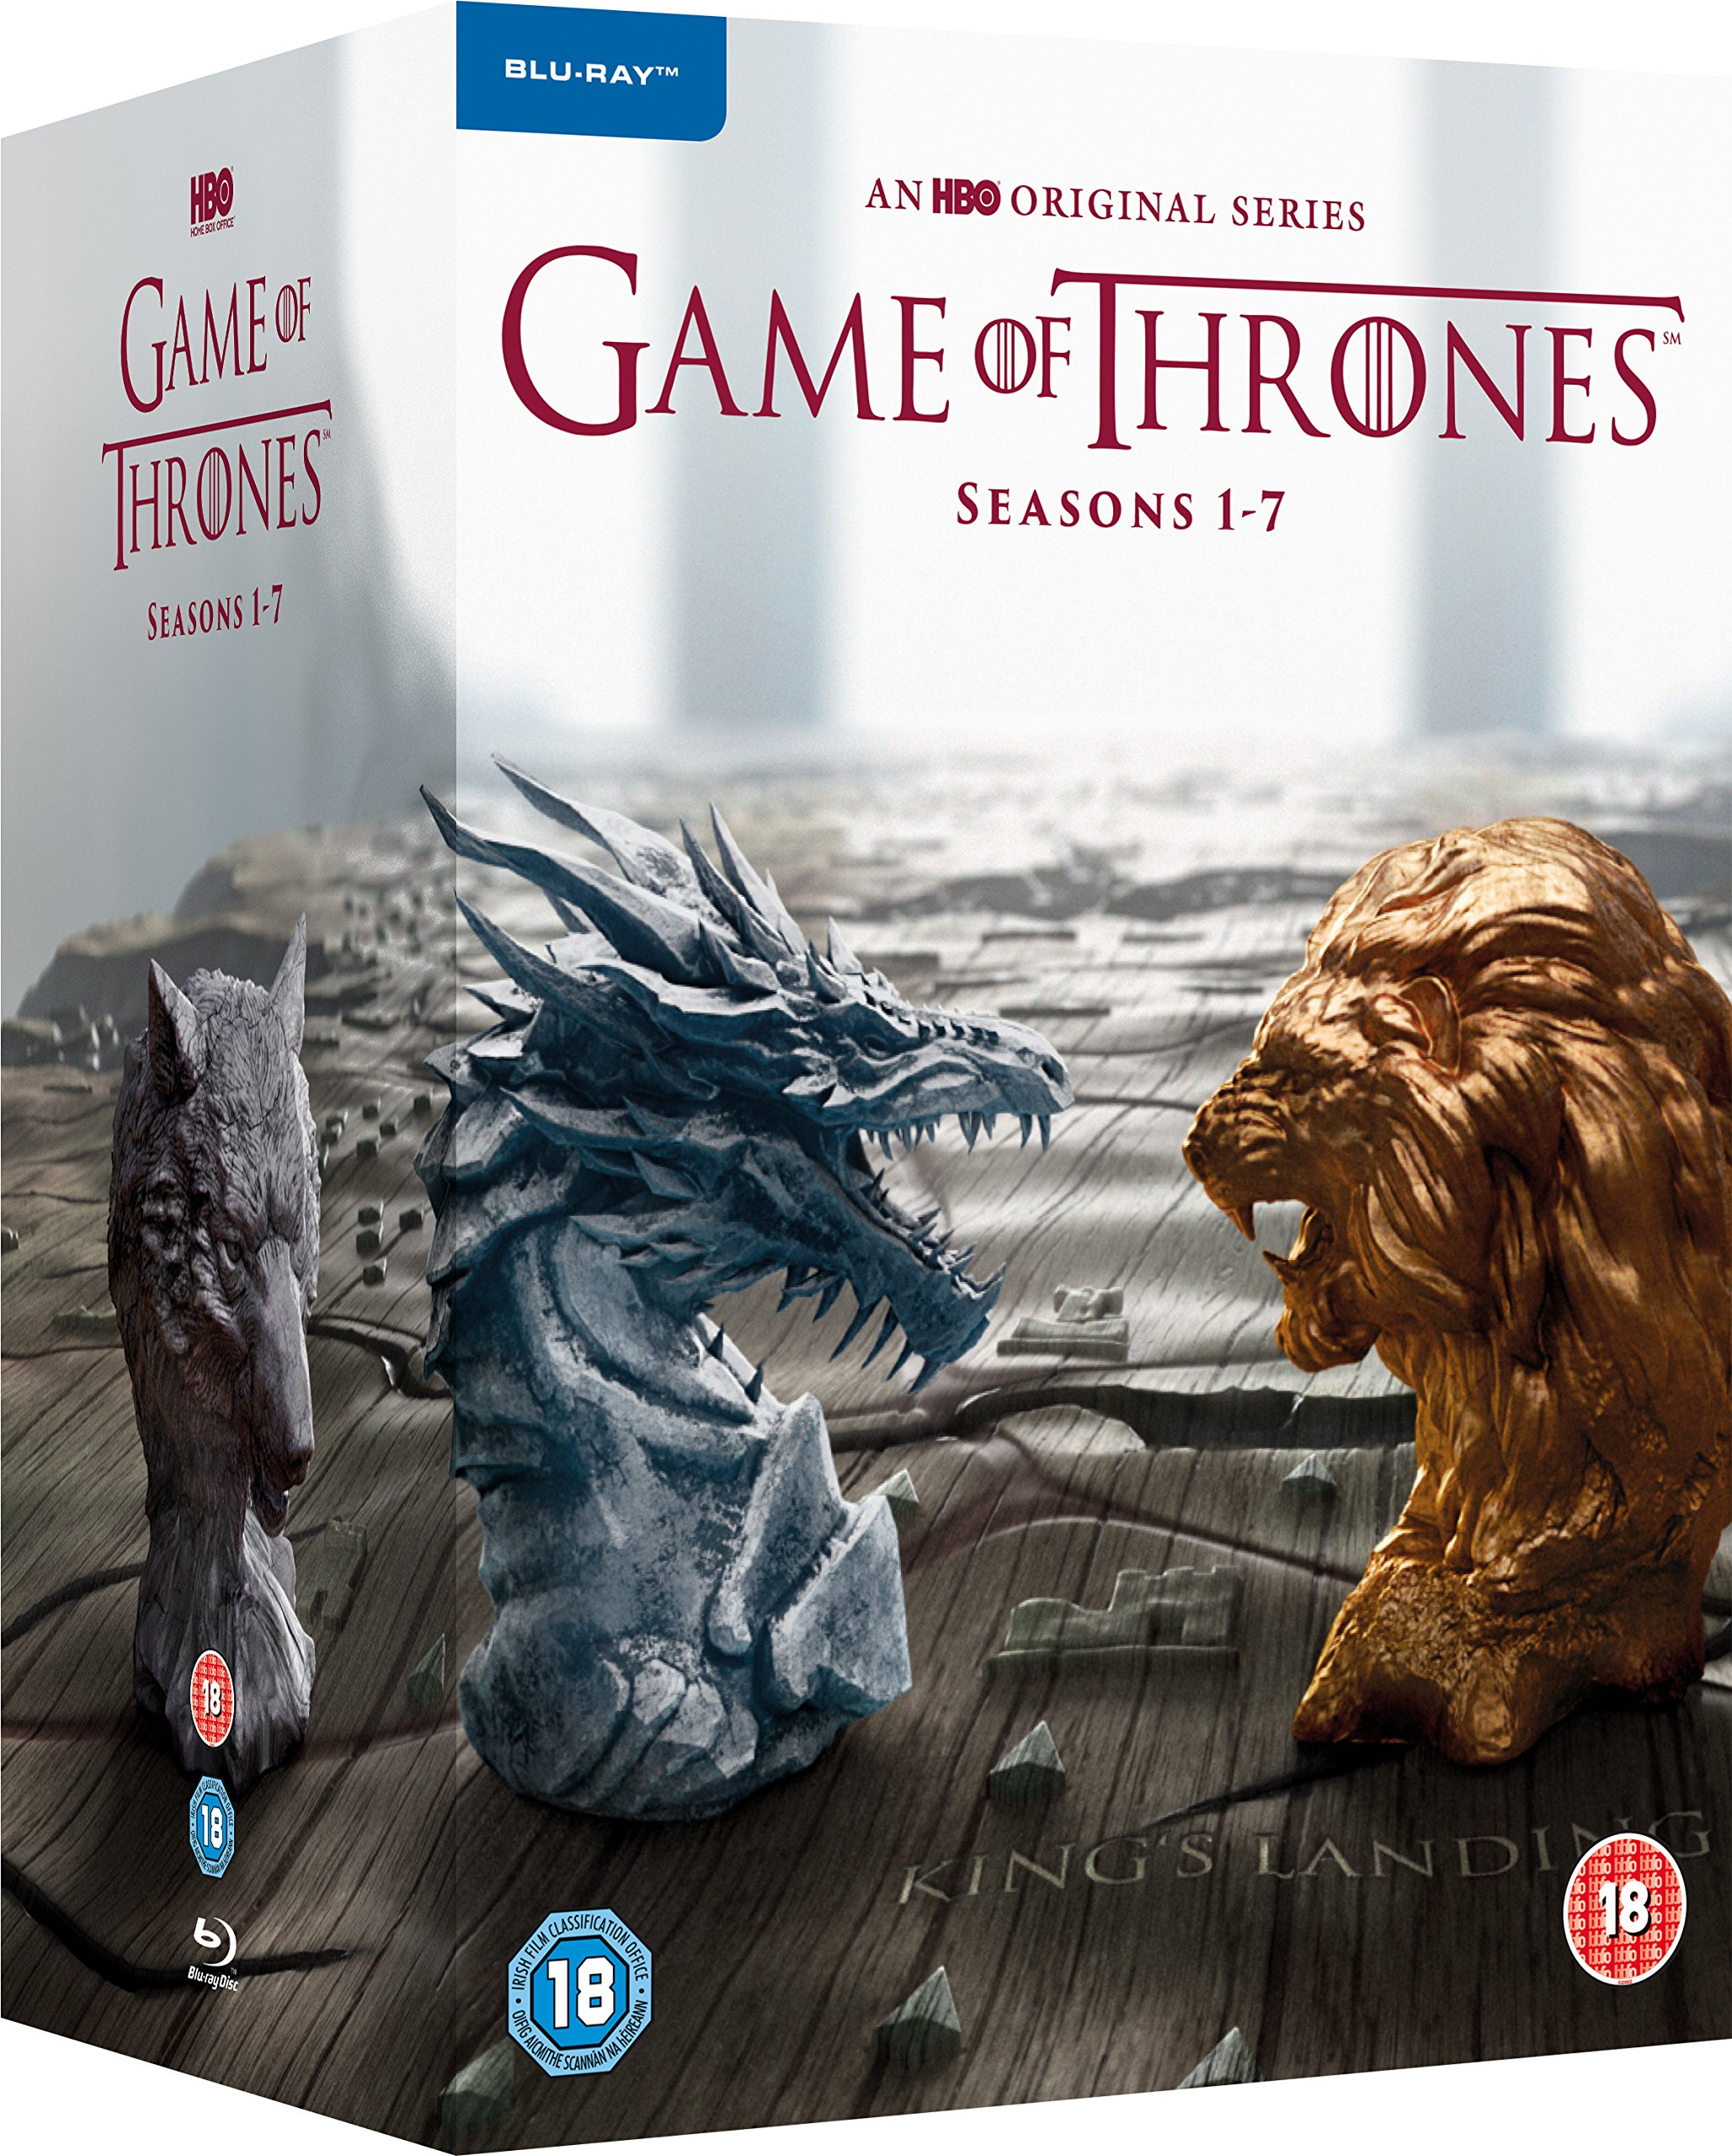 Game of Thrones - Season 1-7 2017  Region Free